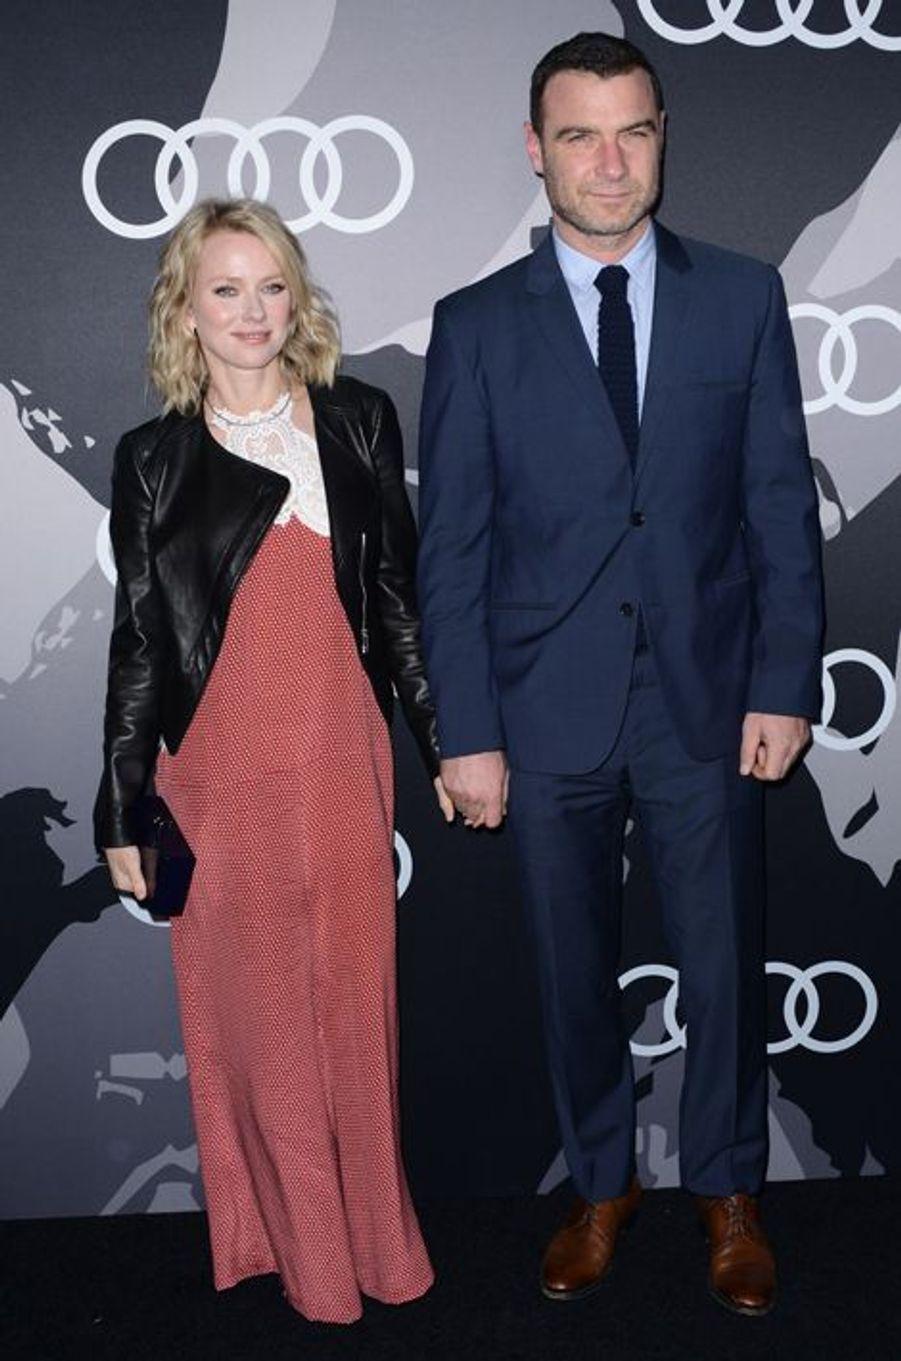 Naomi Watts et Liev Schreiber à Los Angeles le 8 janvier 2014